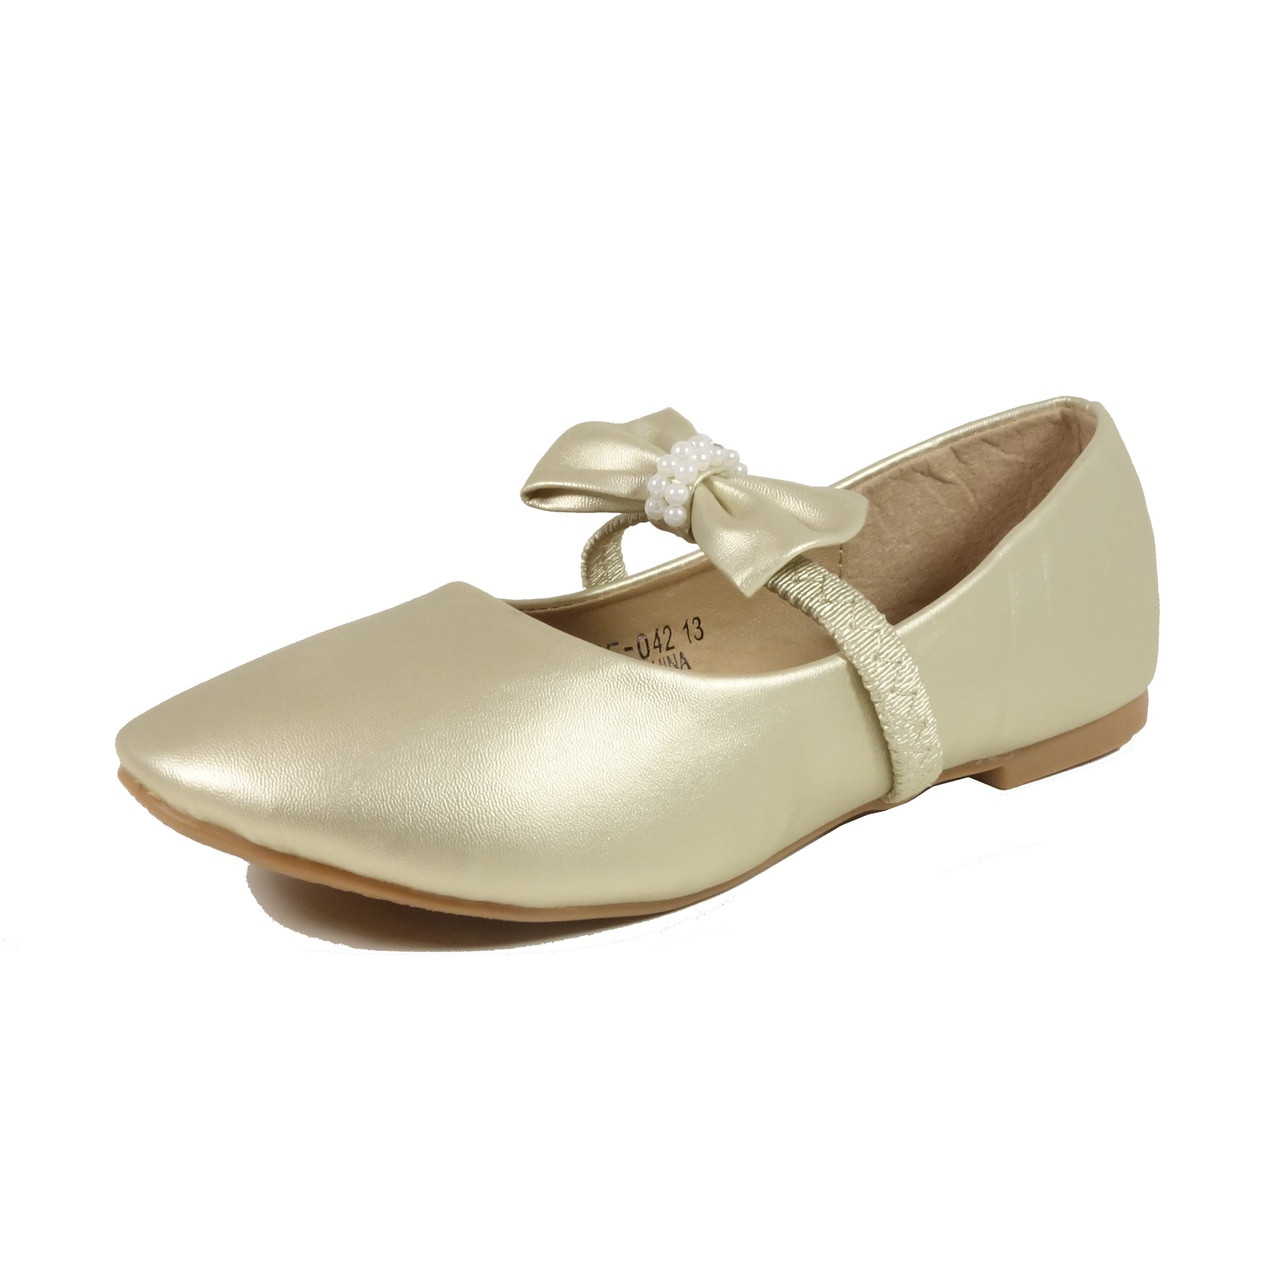 Nova Utopia Toddler Little Girls Flat Shoes - NFGF042 Champagne ...